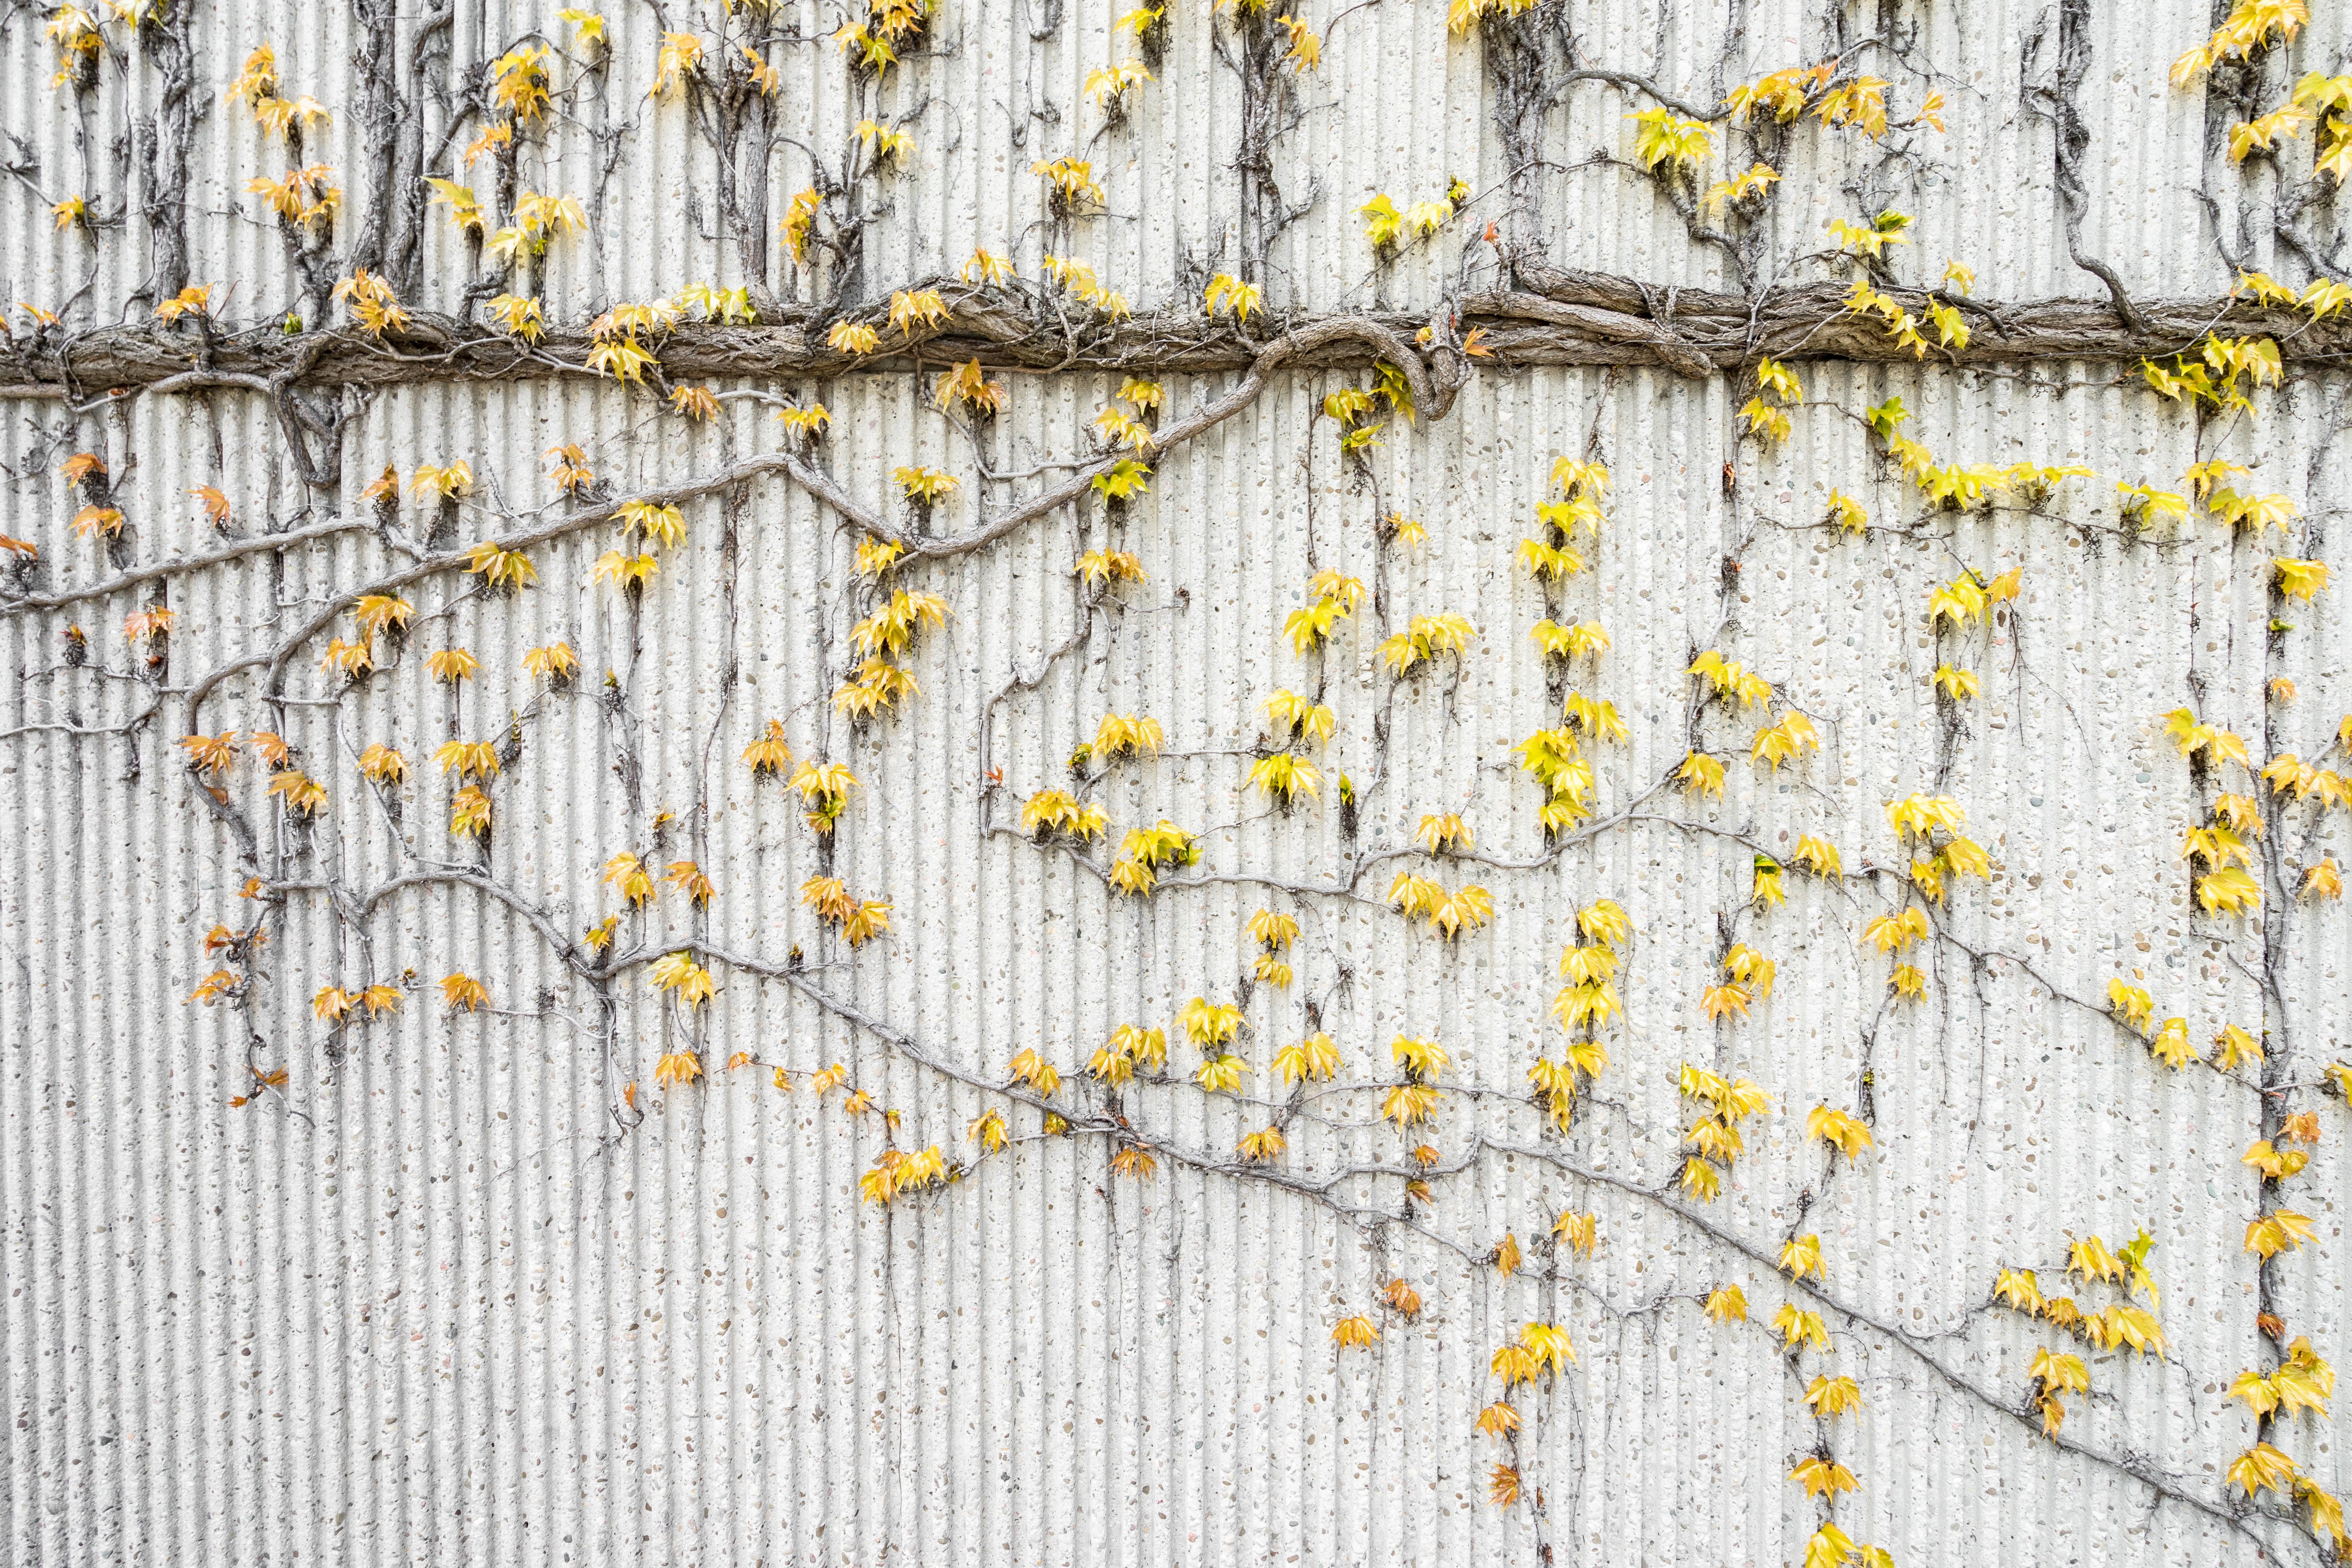 Fotos gratis : rama, textura, hoja, pared, patrón, línea, amarillo ...